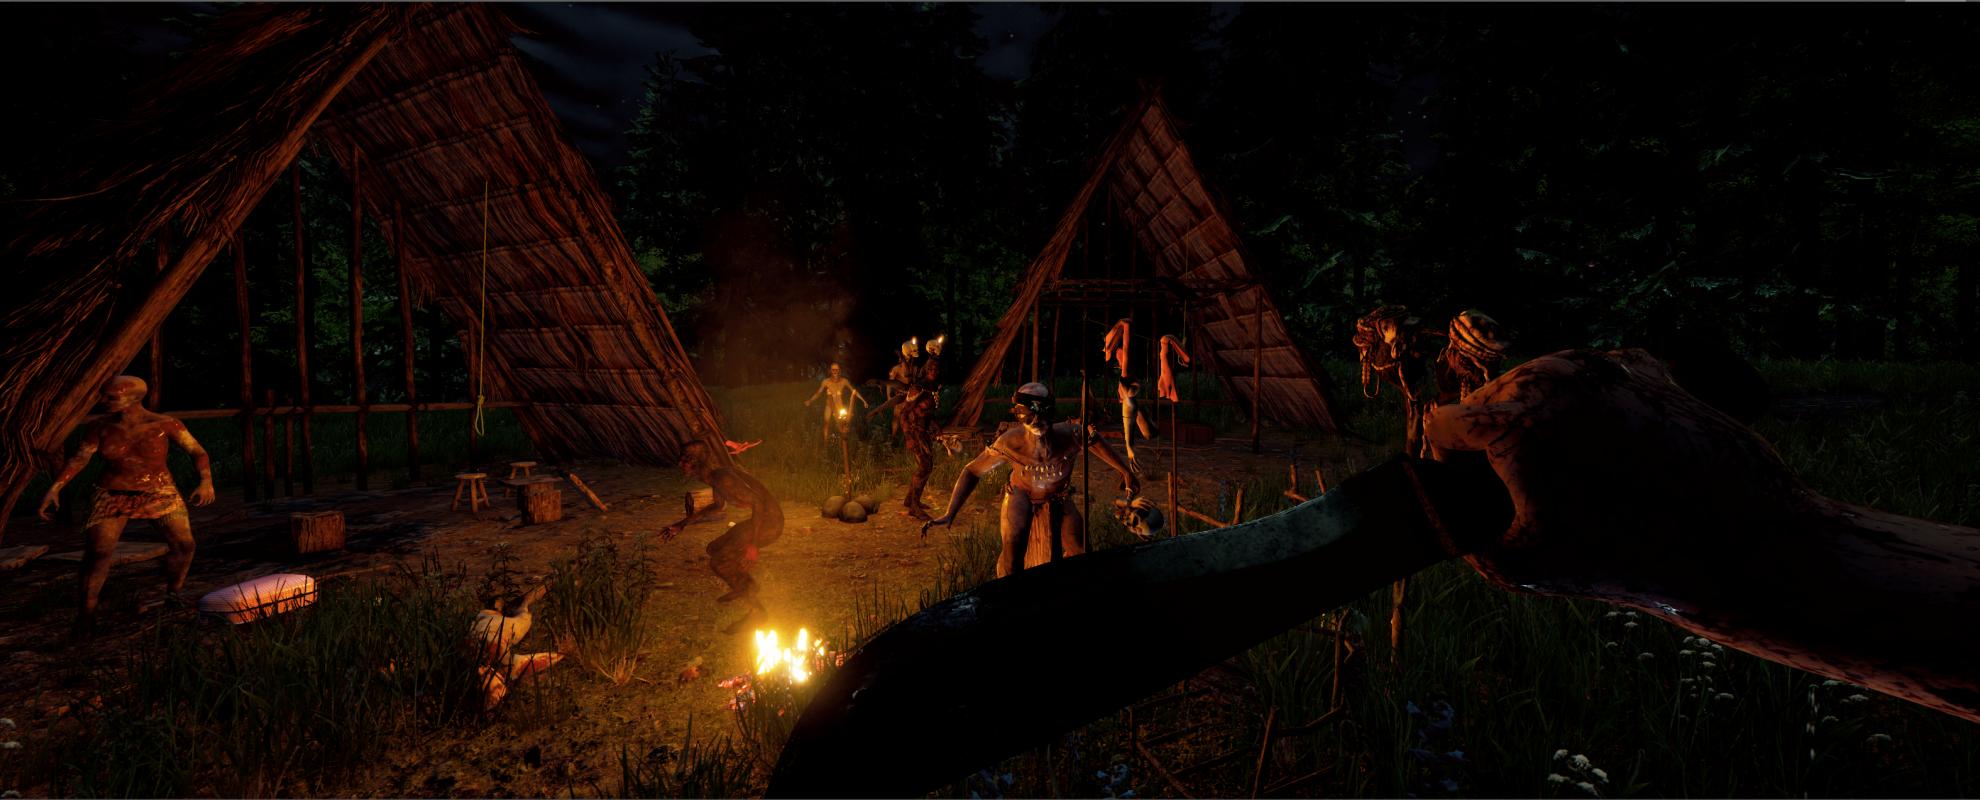 Endnight Games